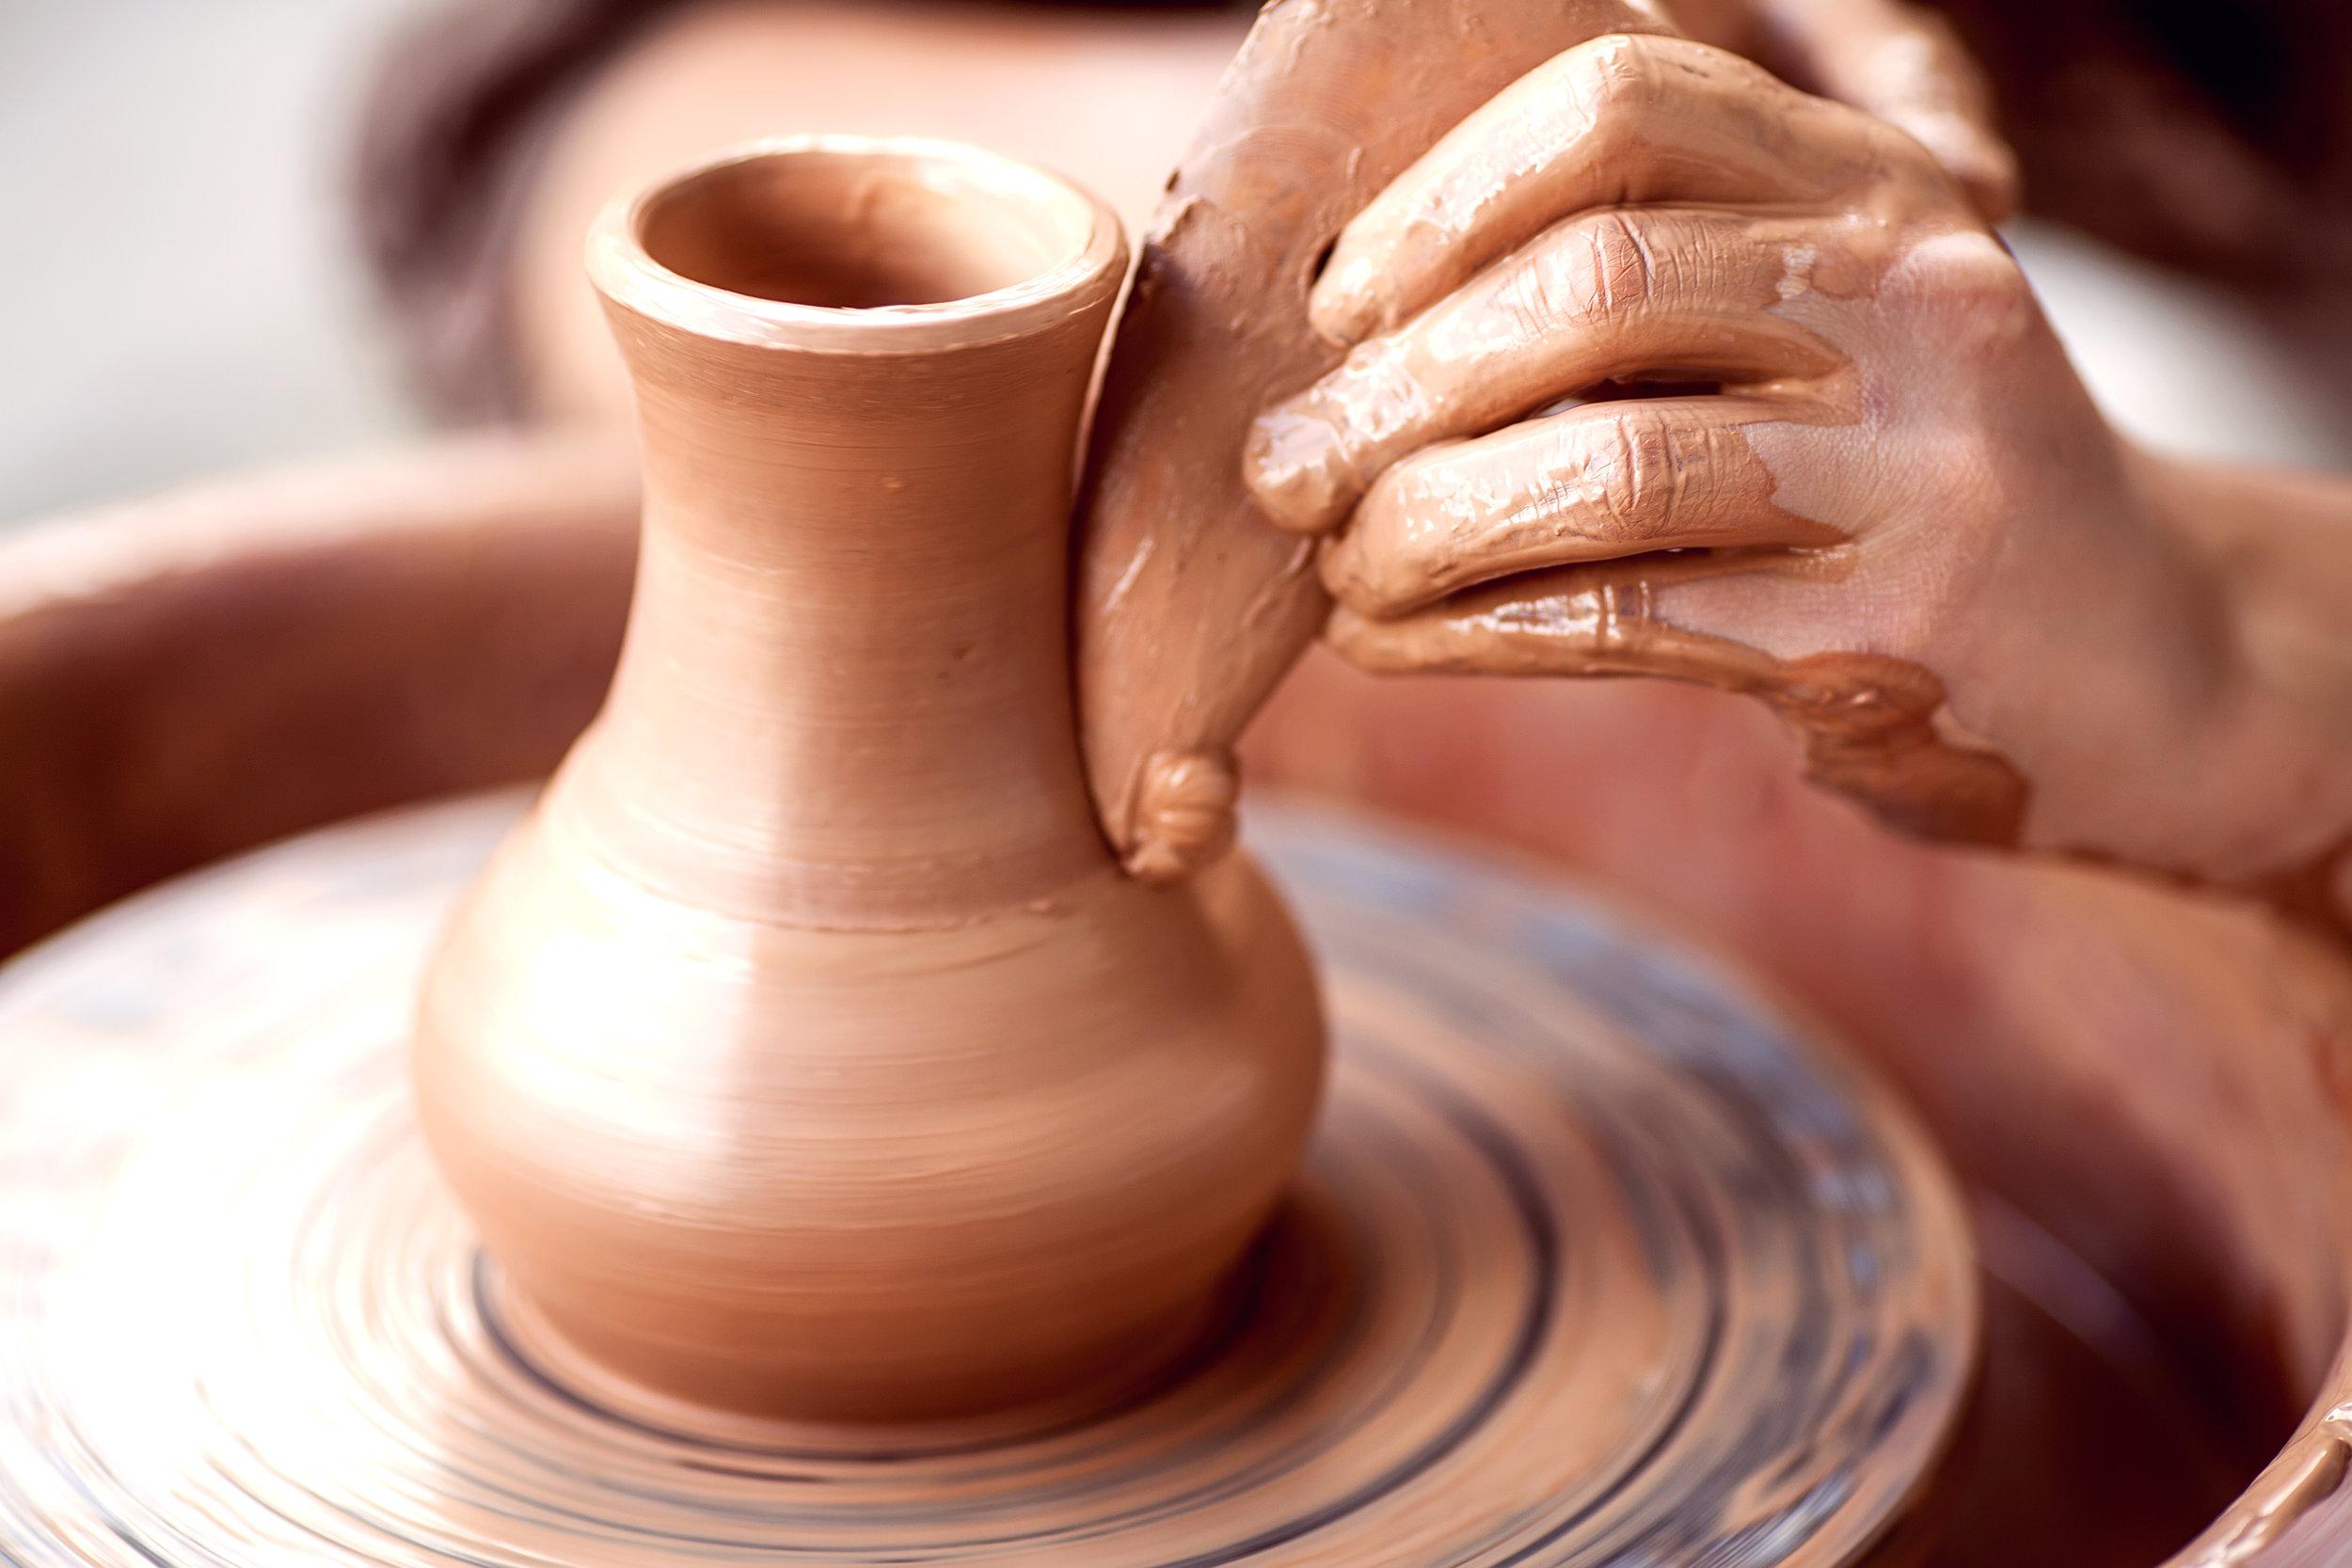 clay_formation.jpg